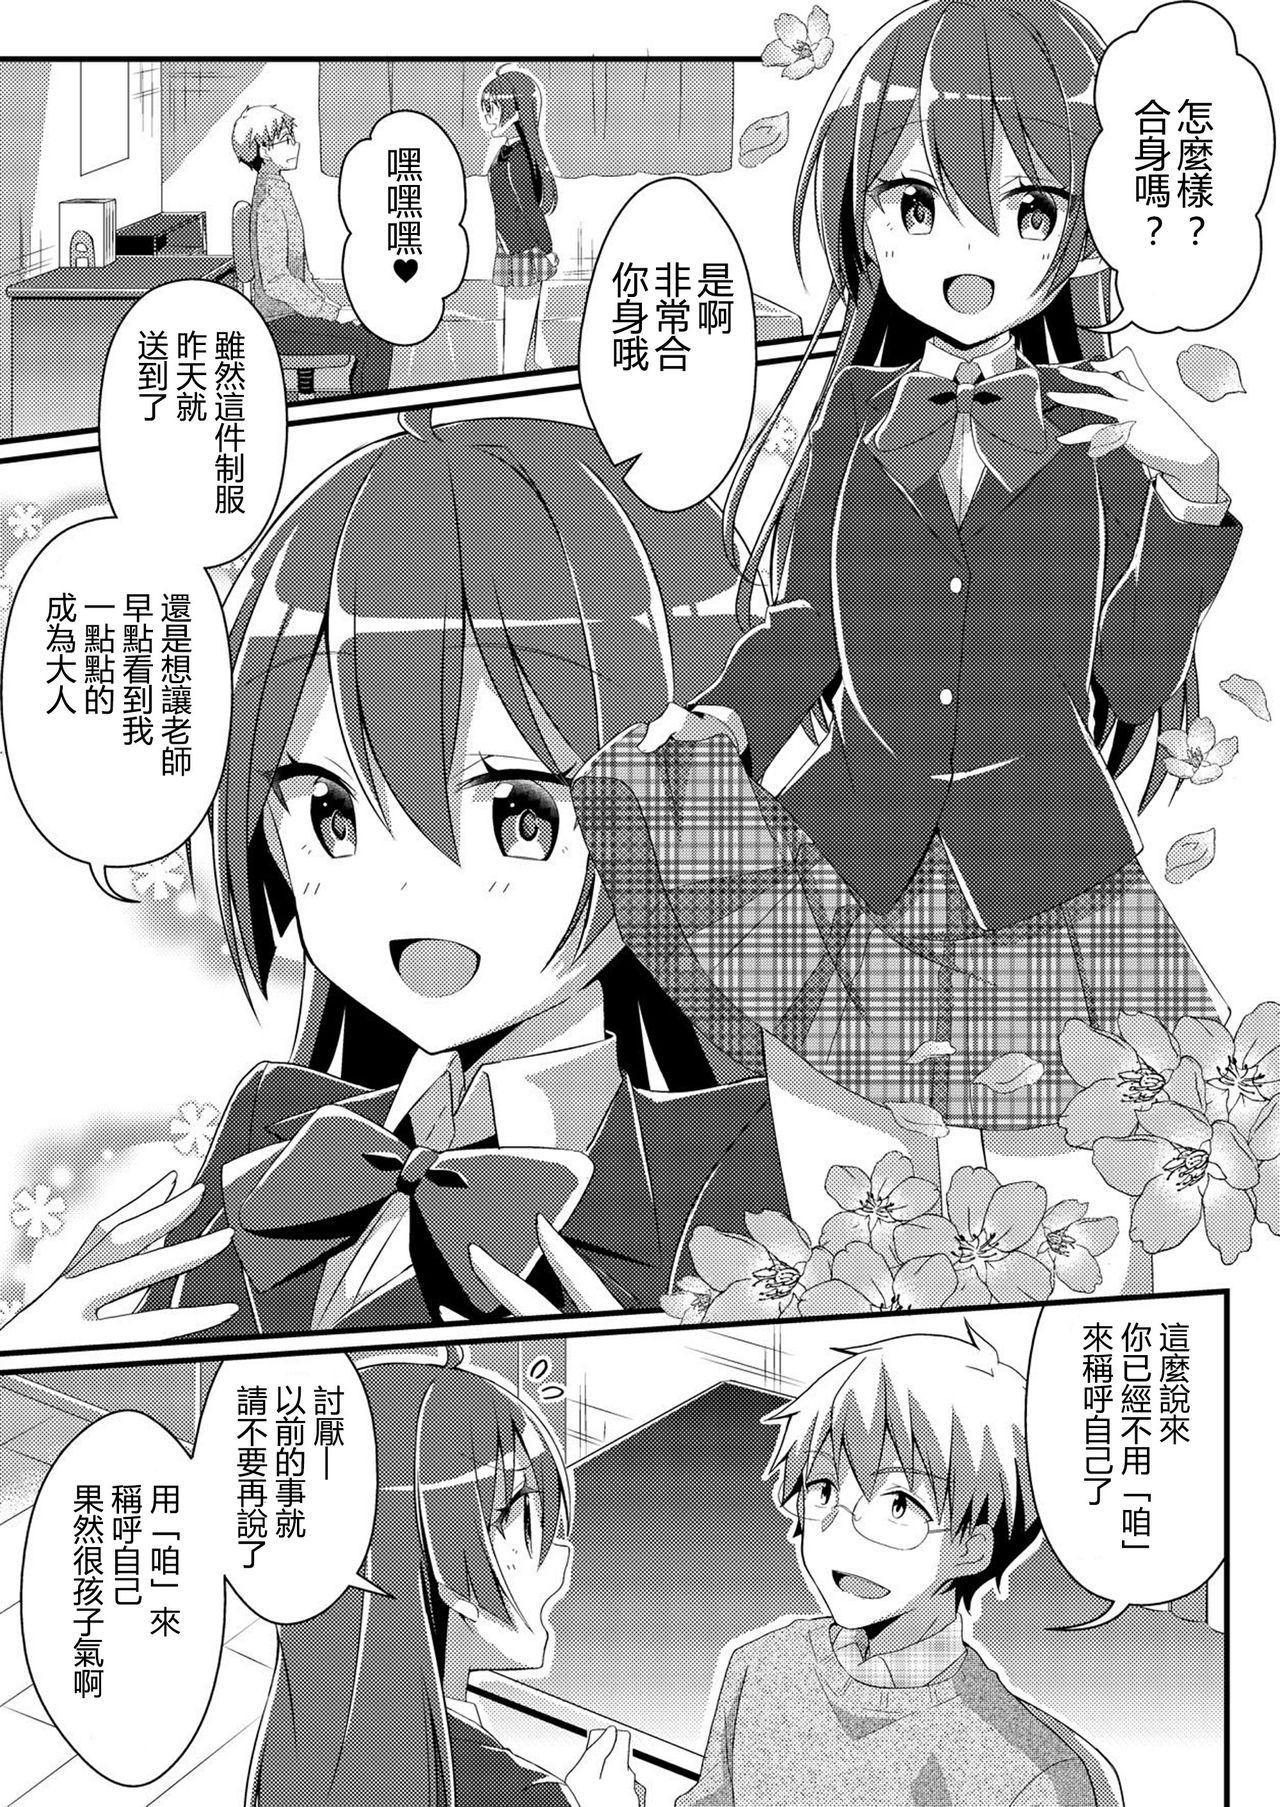 Toshiue e no Doukei 32